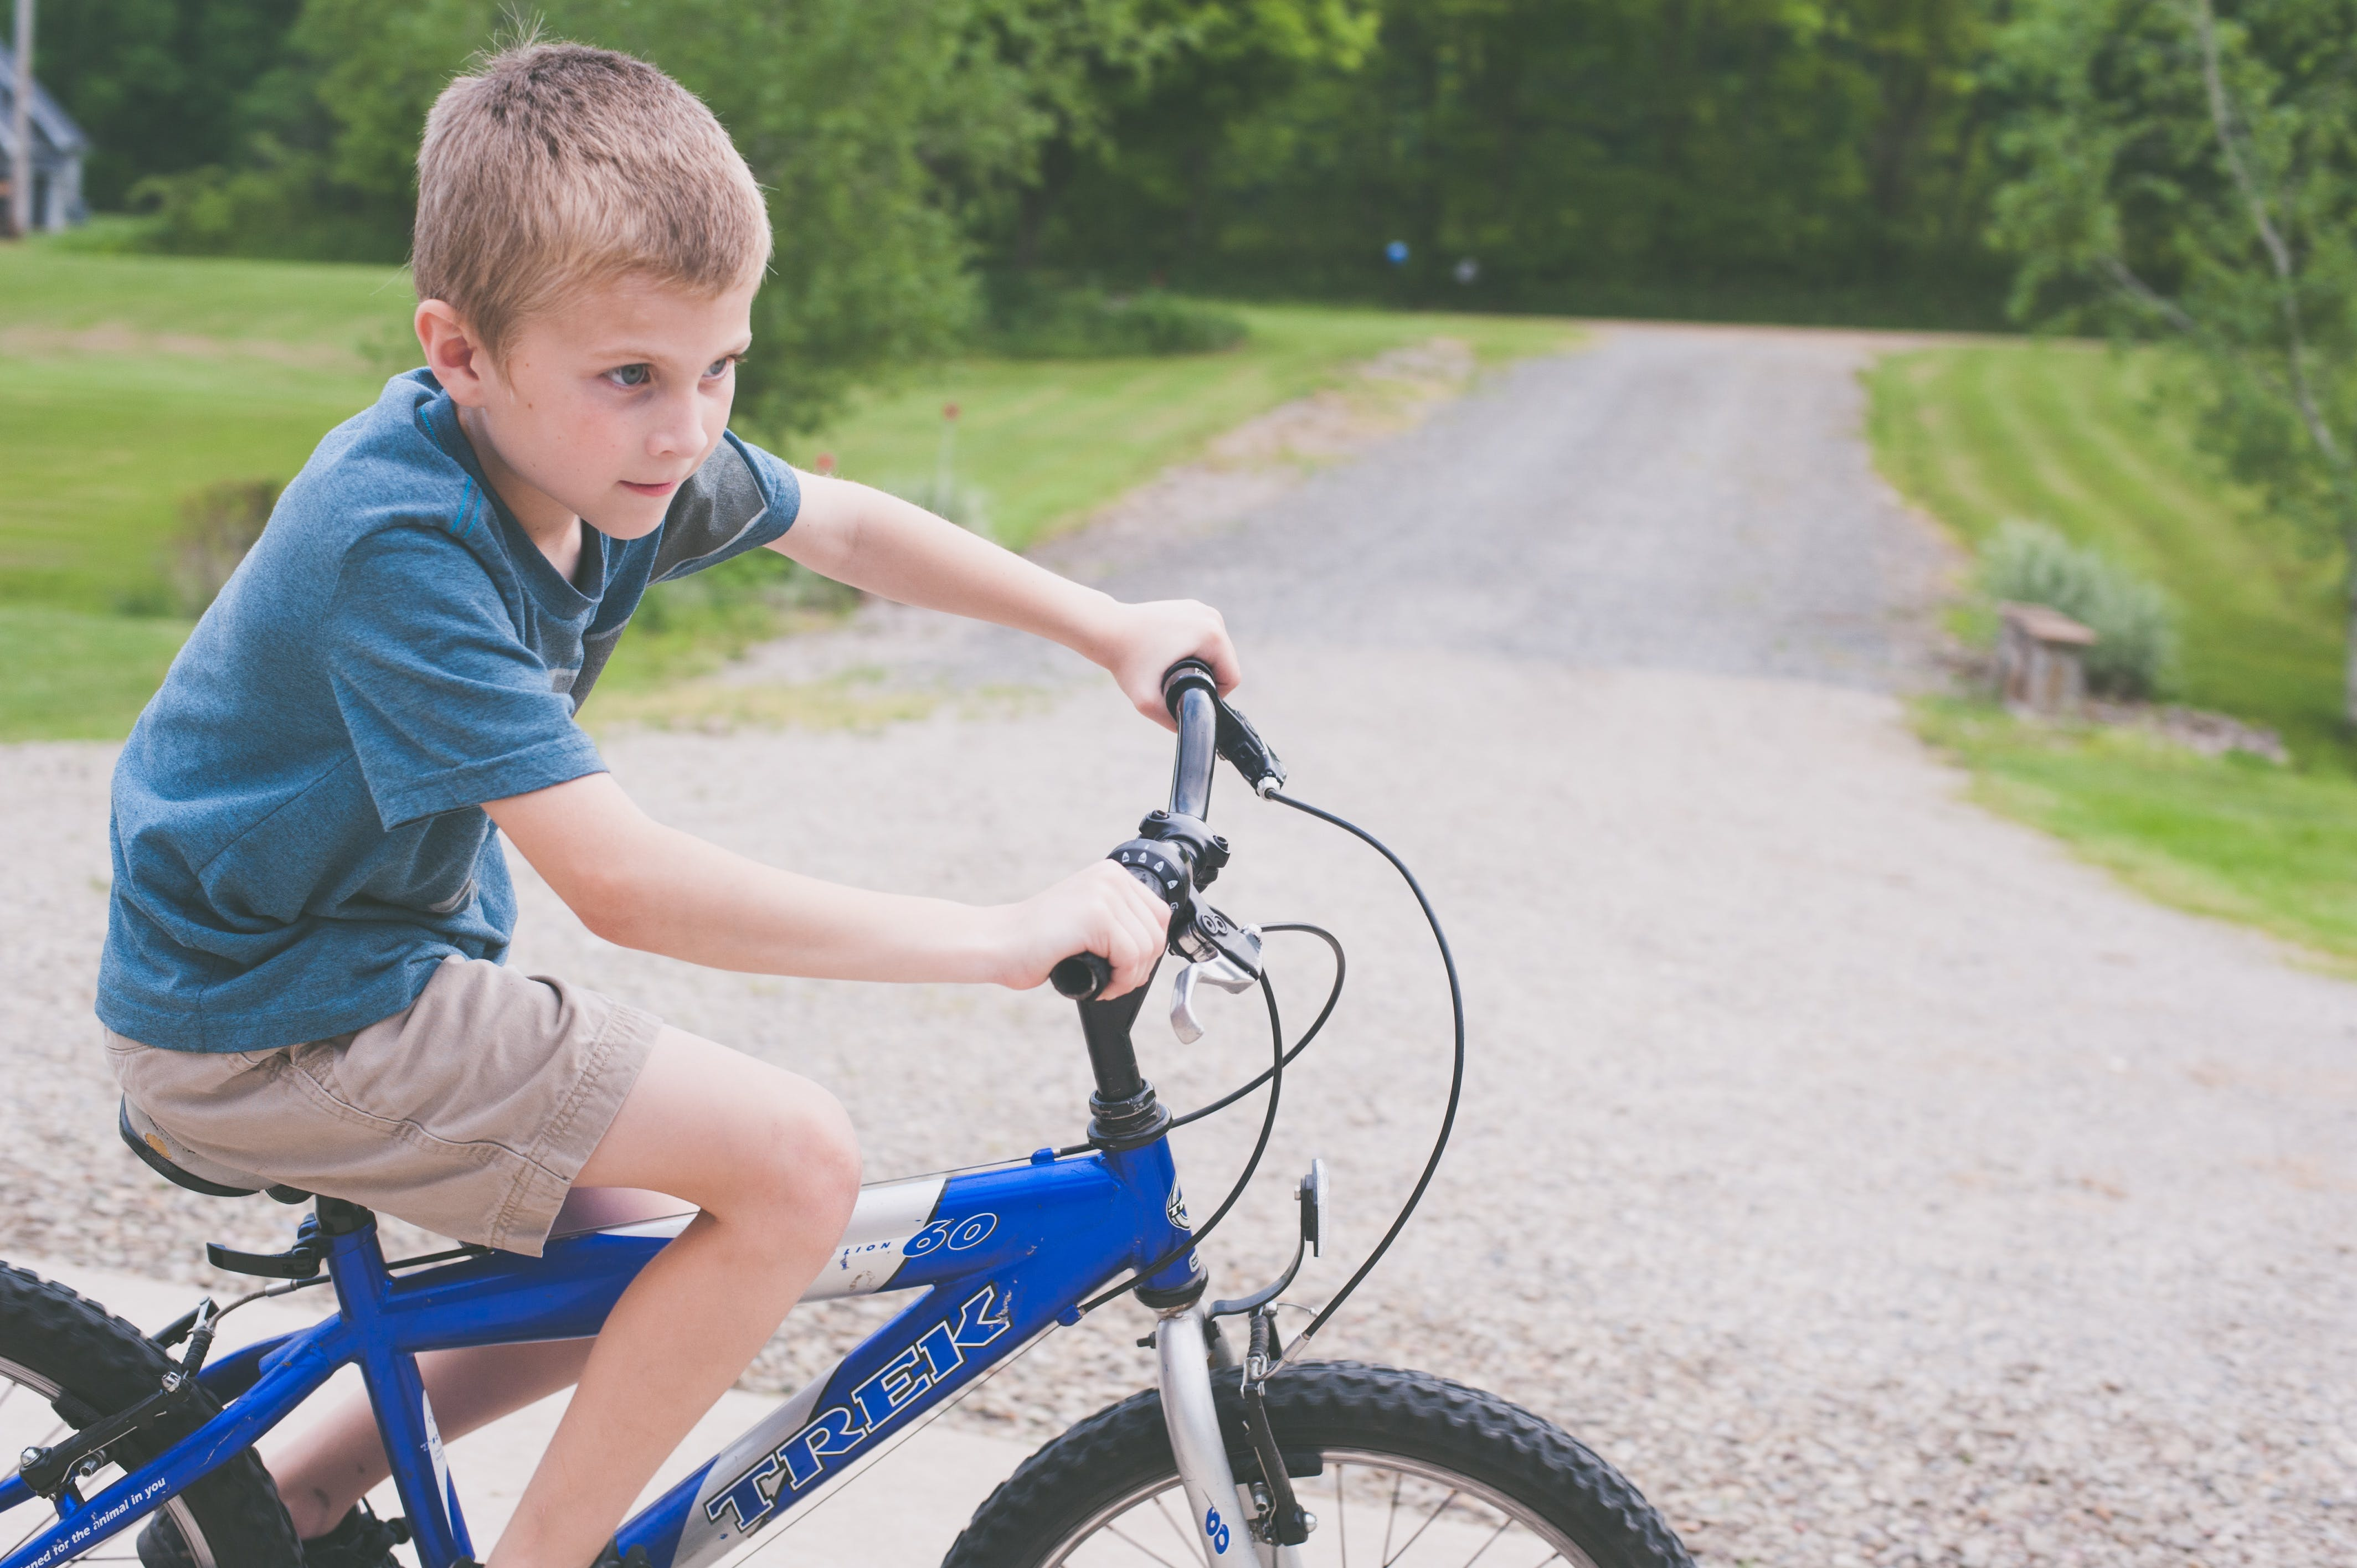 zu fahrrad, junge, kind, straße